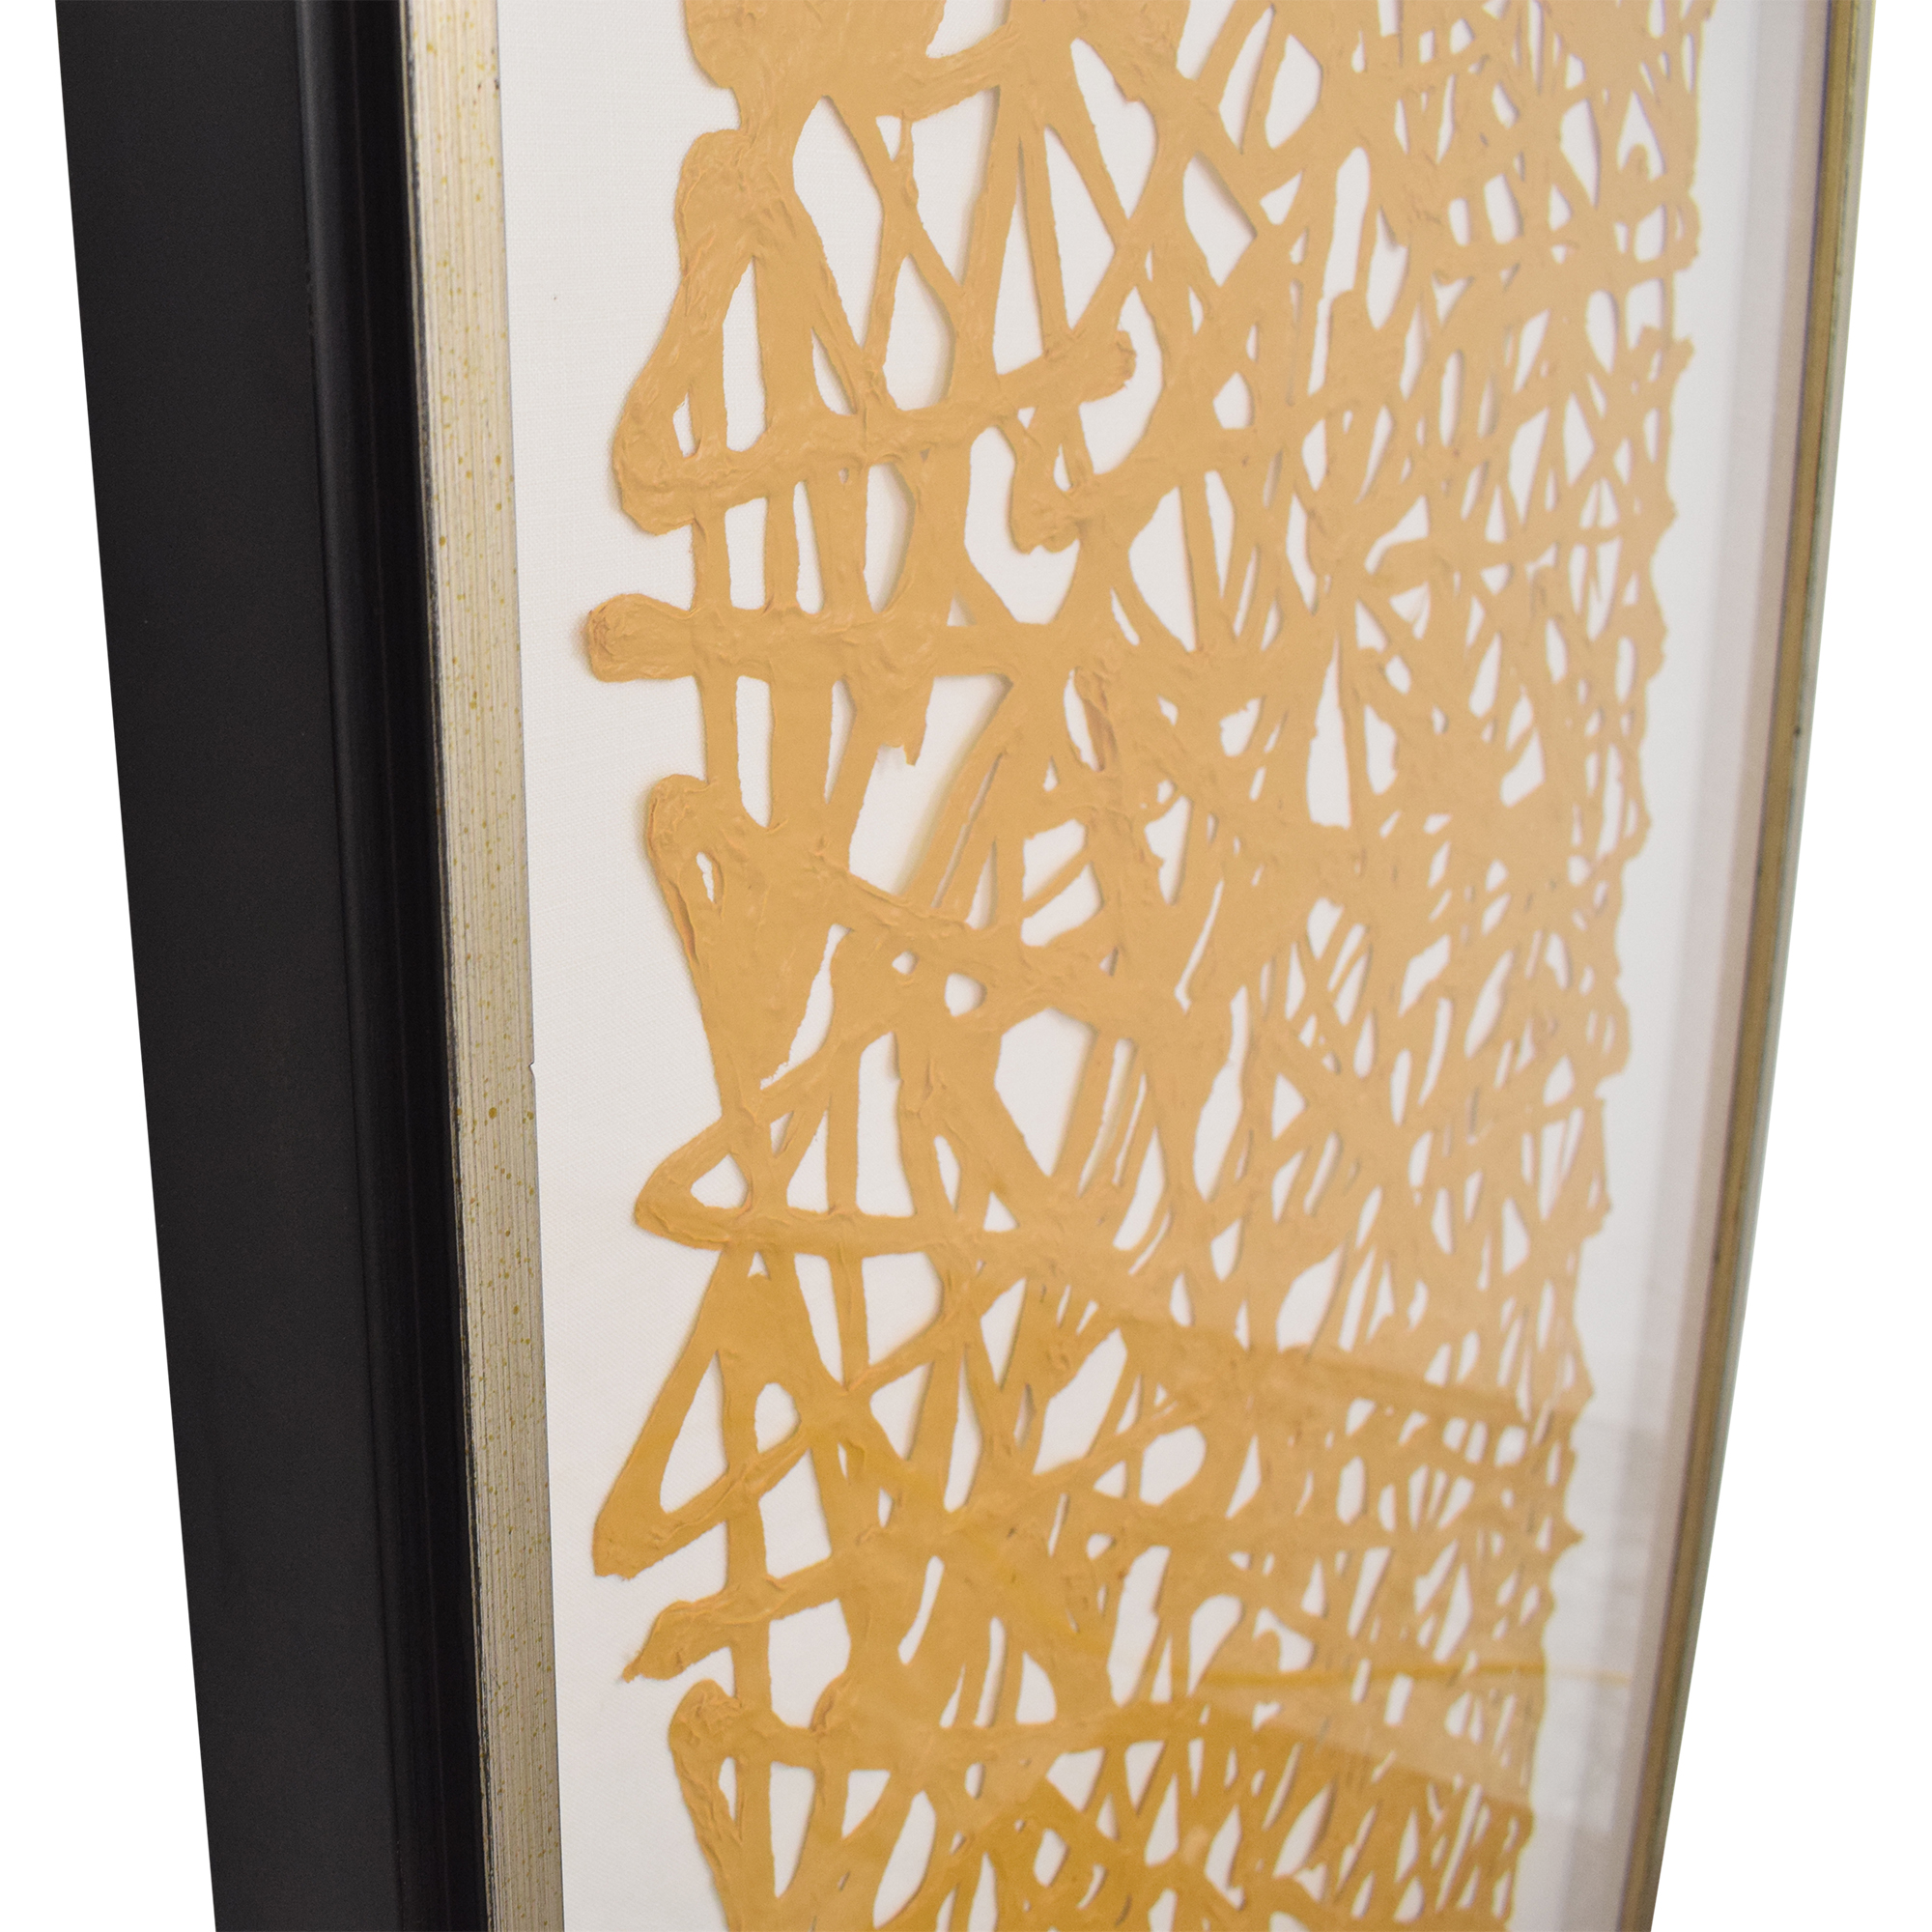 buy Ethan Allen Mustard Paper Art Ethan Allen